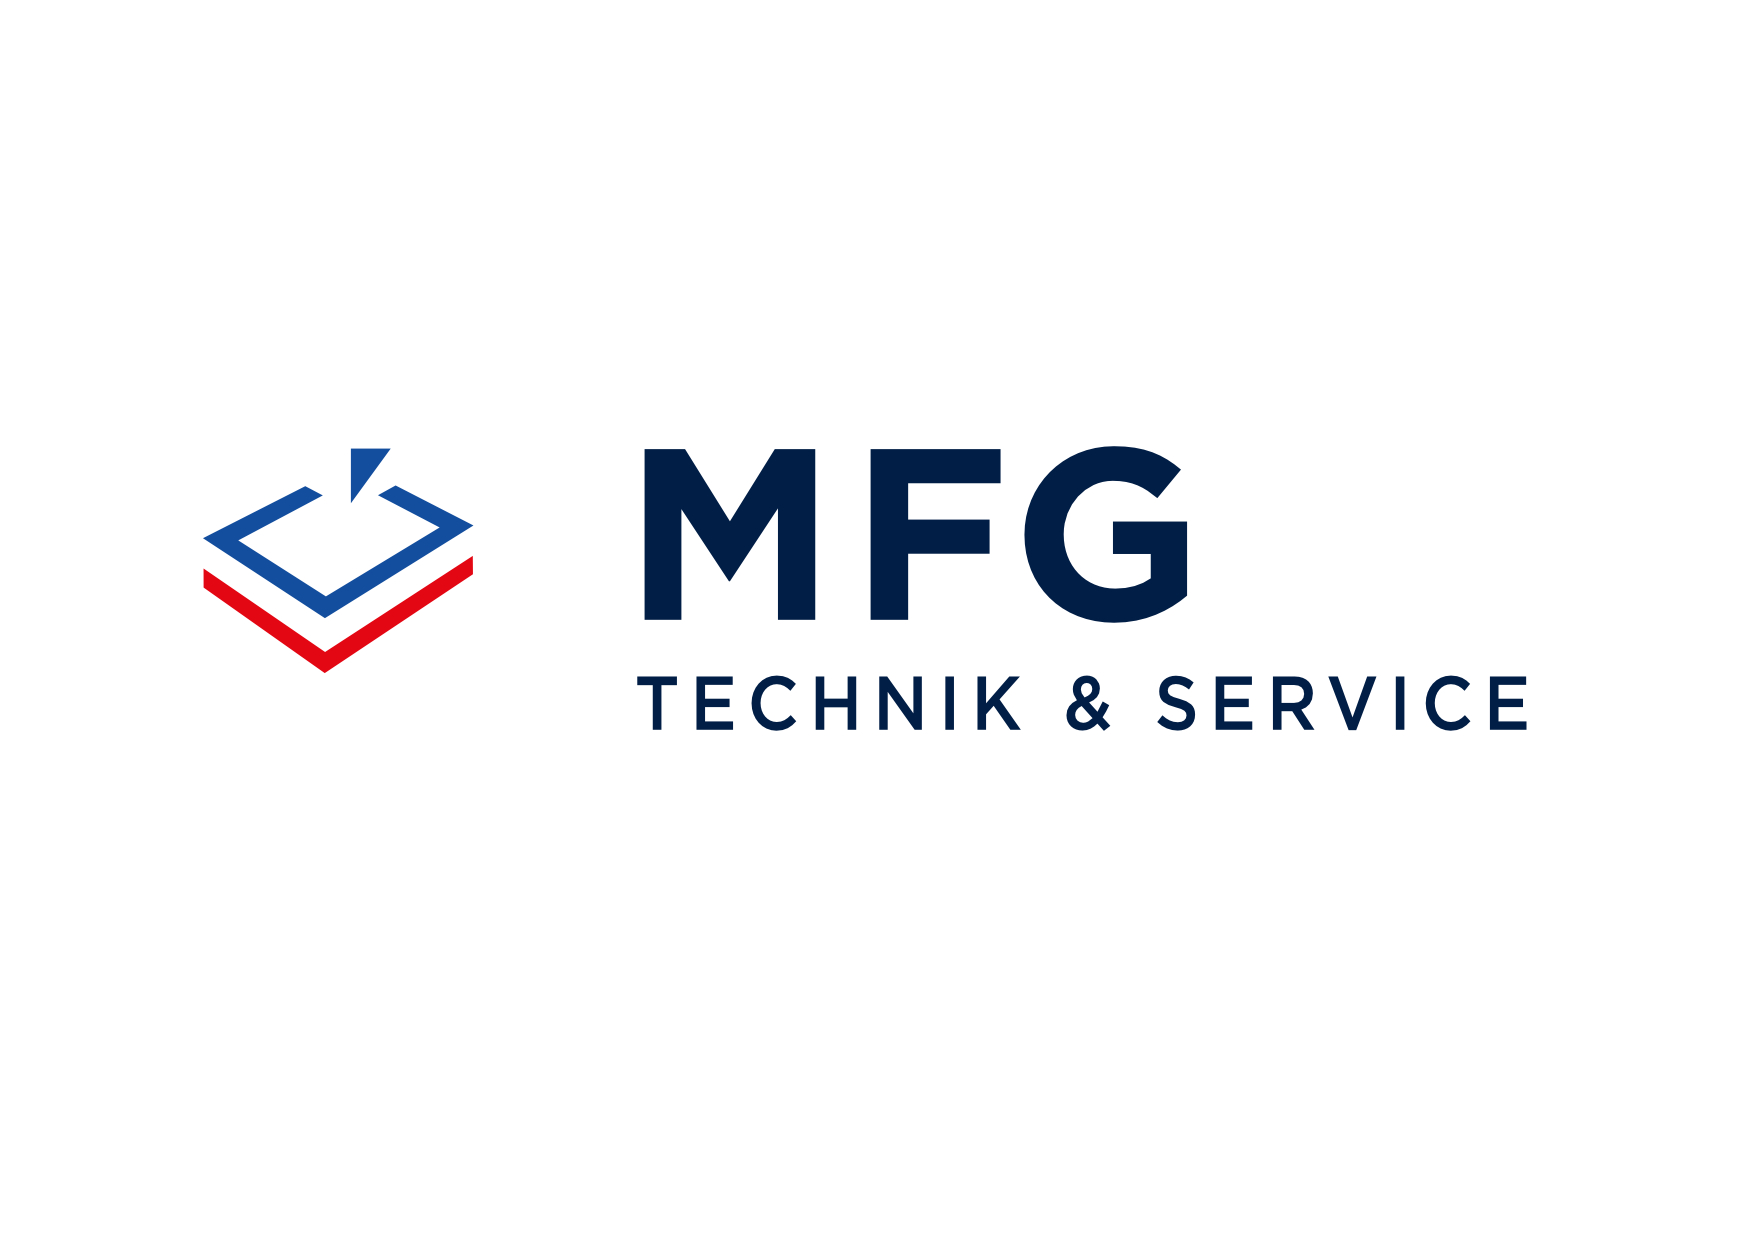 MFG Technik & Service GmbH